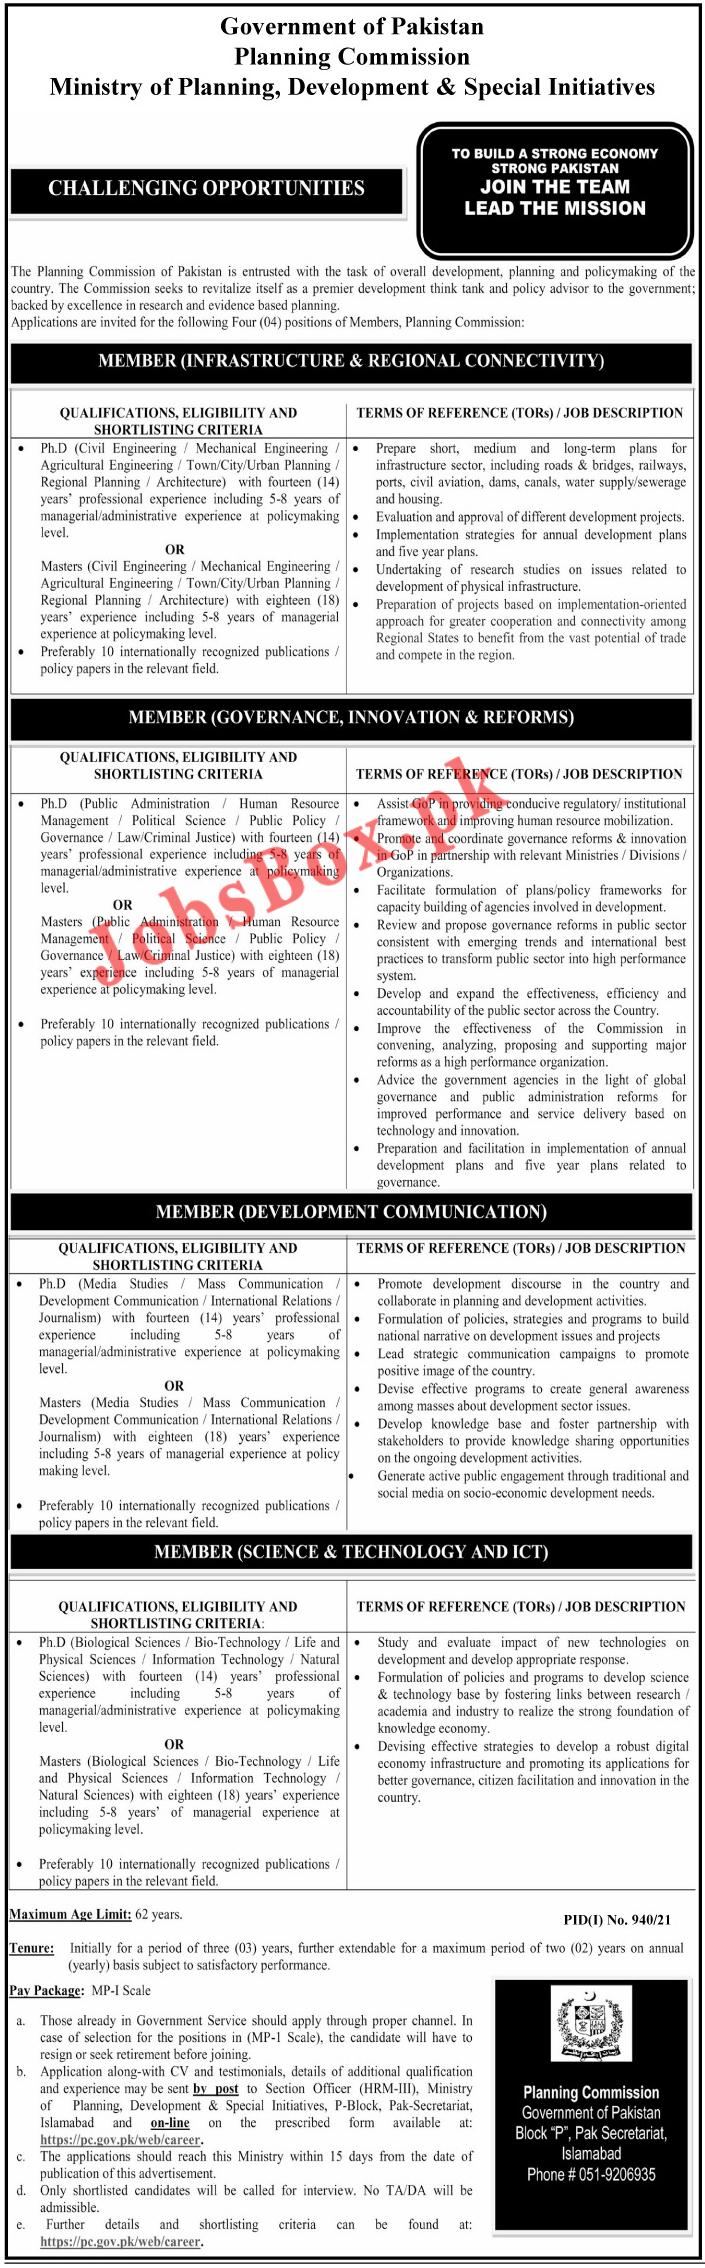 Planning Commission of Pakistan PC Jobs 2021 - www.pc.gov.pk